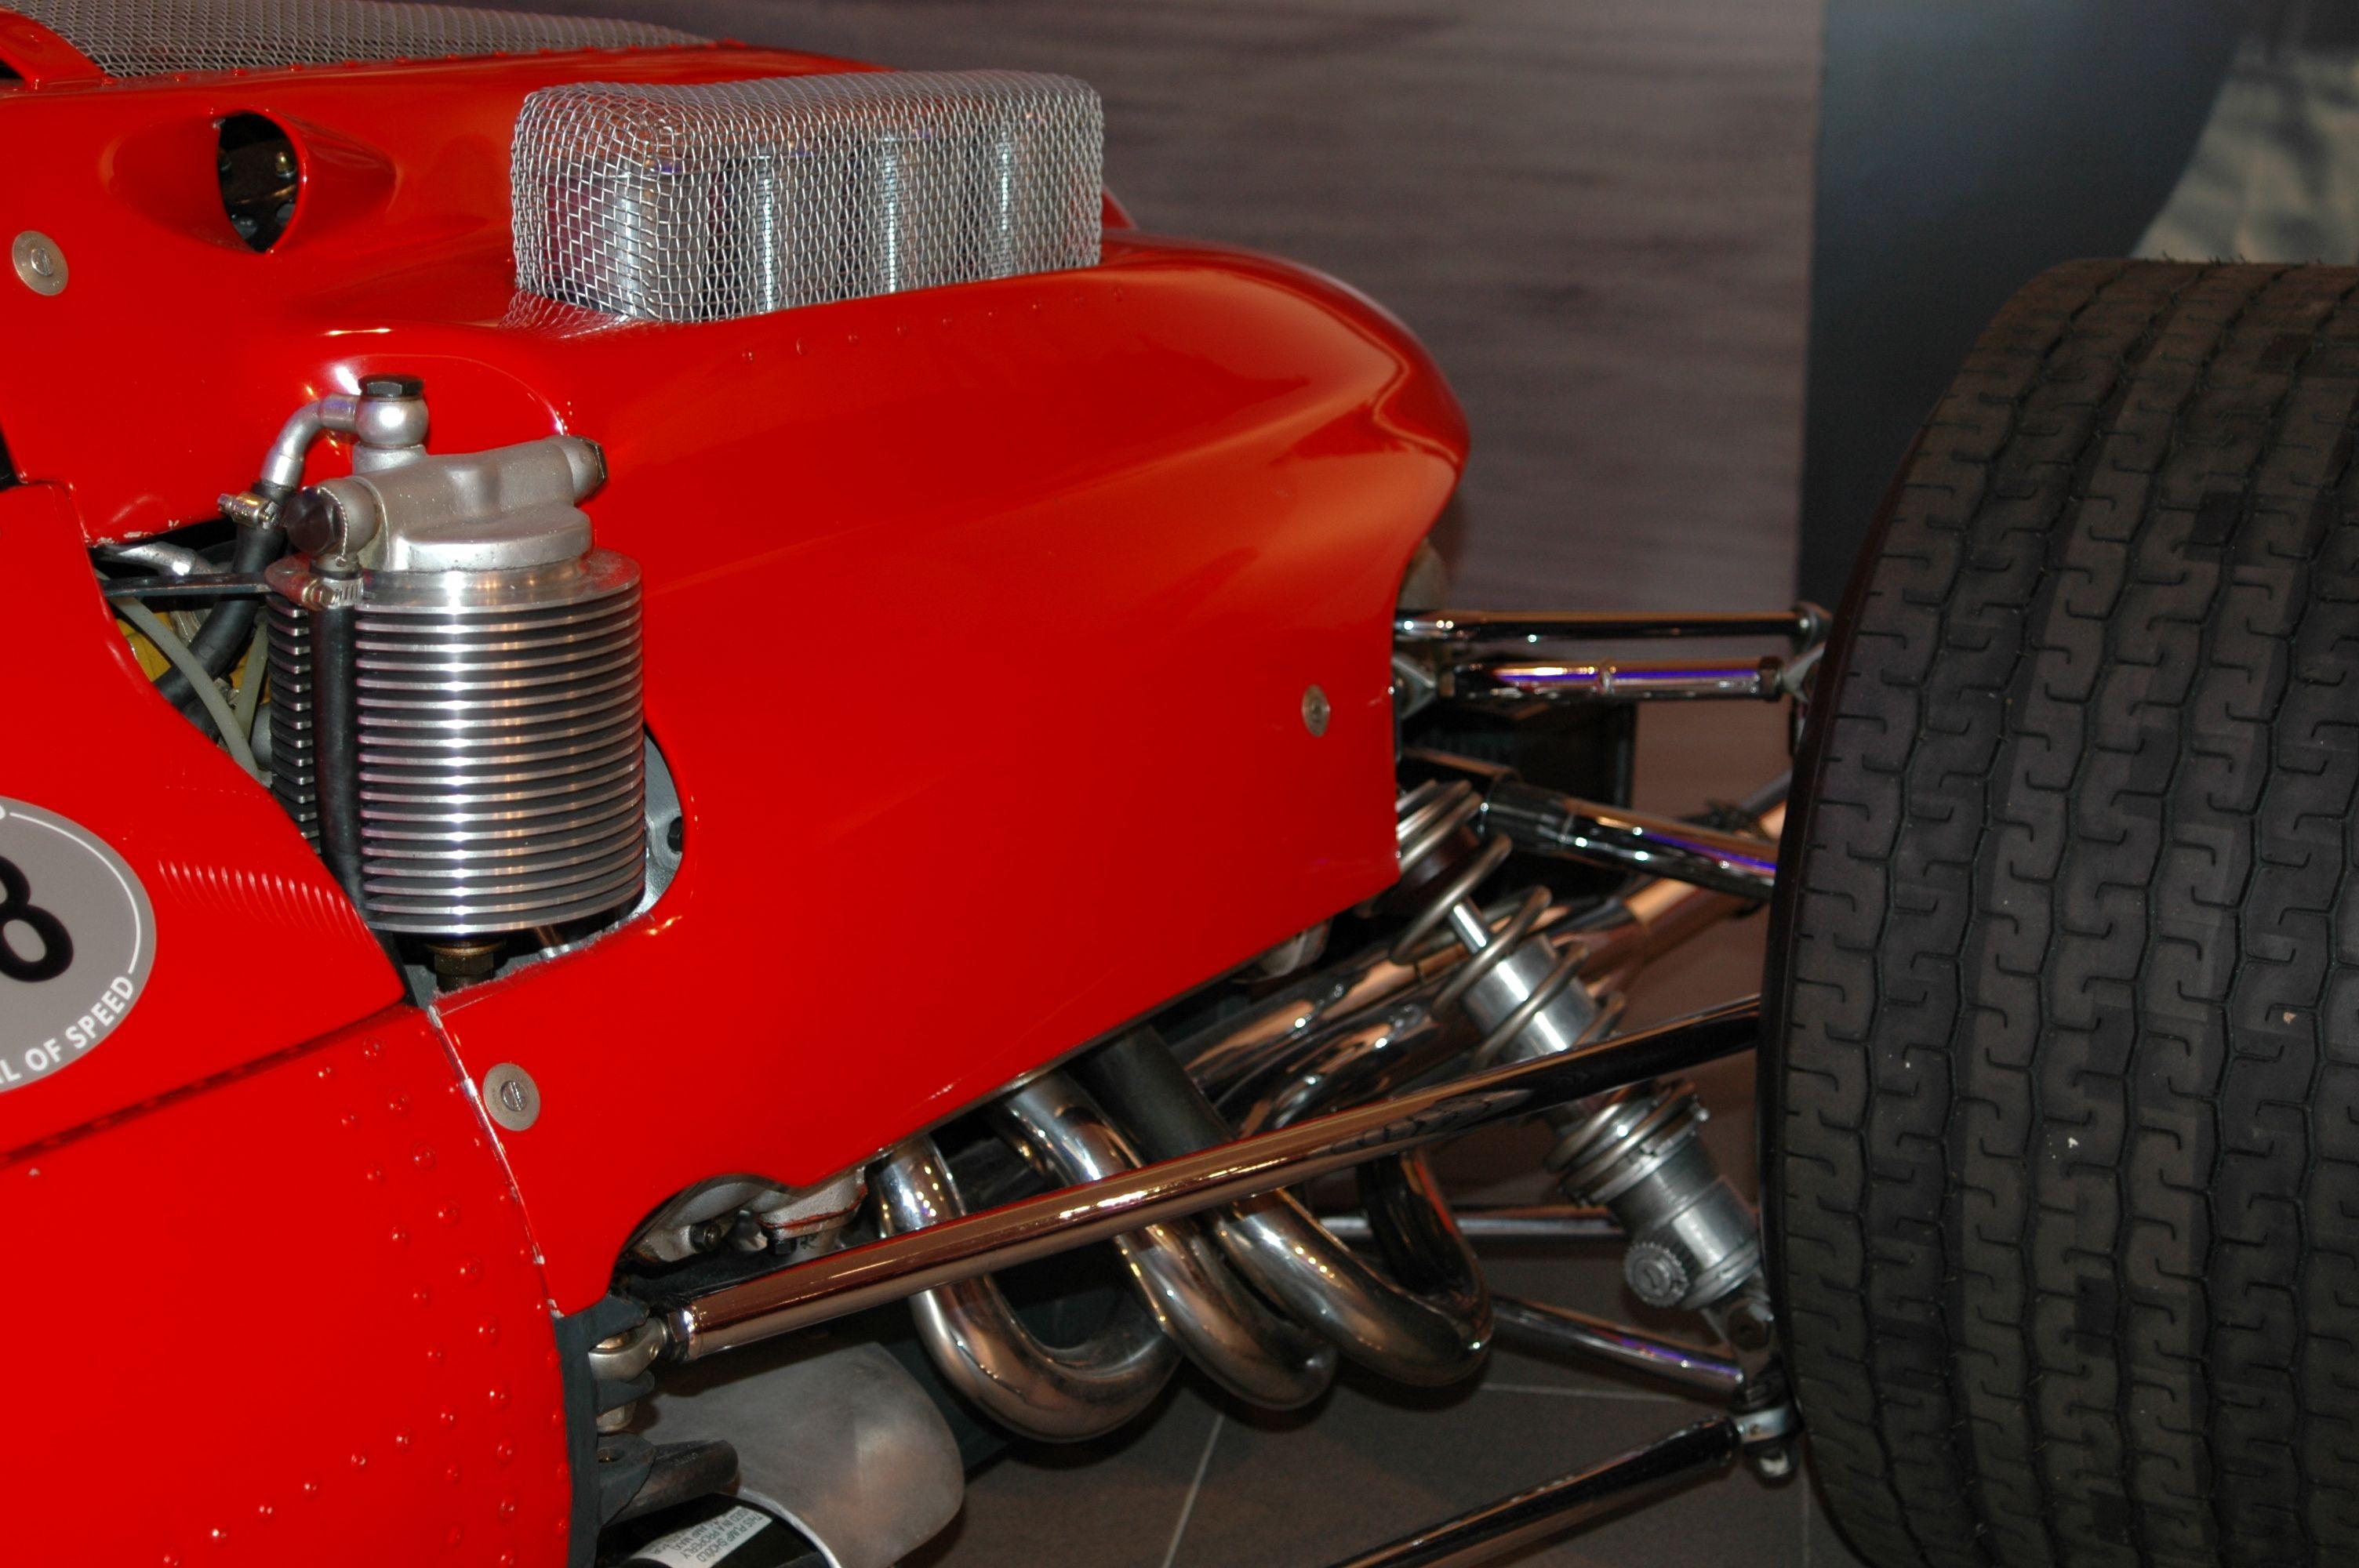 Ferrari_158_F1_1964_suspension Διπλά ψαλίδια για κράρημα του τροχού, λόγω μεγάλης ρευστοδυναμικής καταπόνησης.